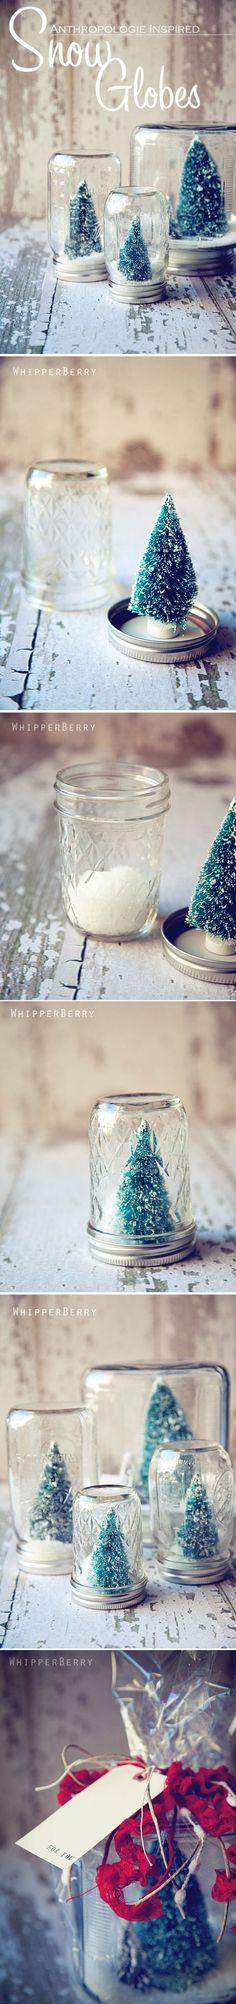 DIY Snow Globes (a use for all those extra wedding mason jars!)